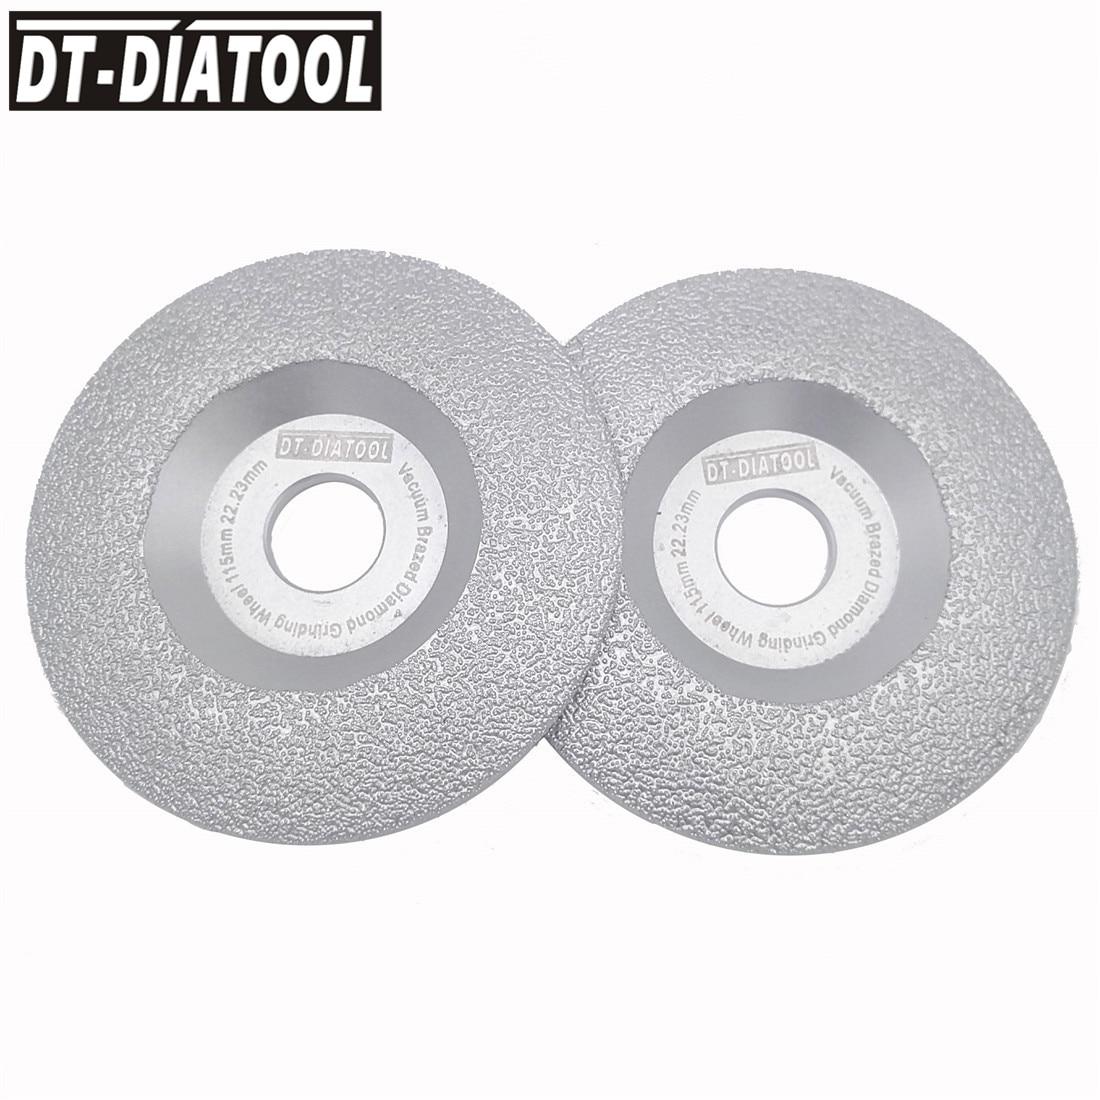 цена на DT-DIATOOL 2pcs Dia 115mm Vacuum Brazed Diamond Wheel Grinding Disc Faster Speed Longer Life 4.5 inch Construction Material